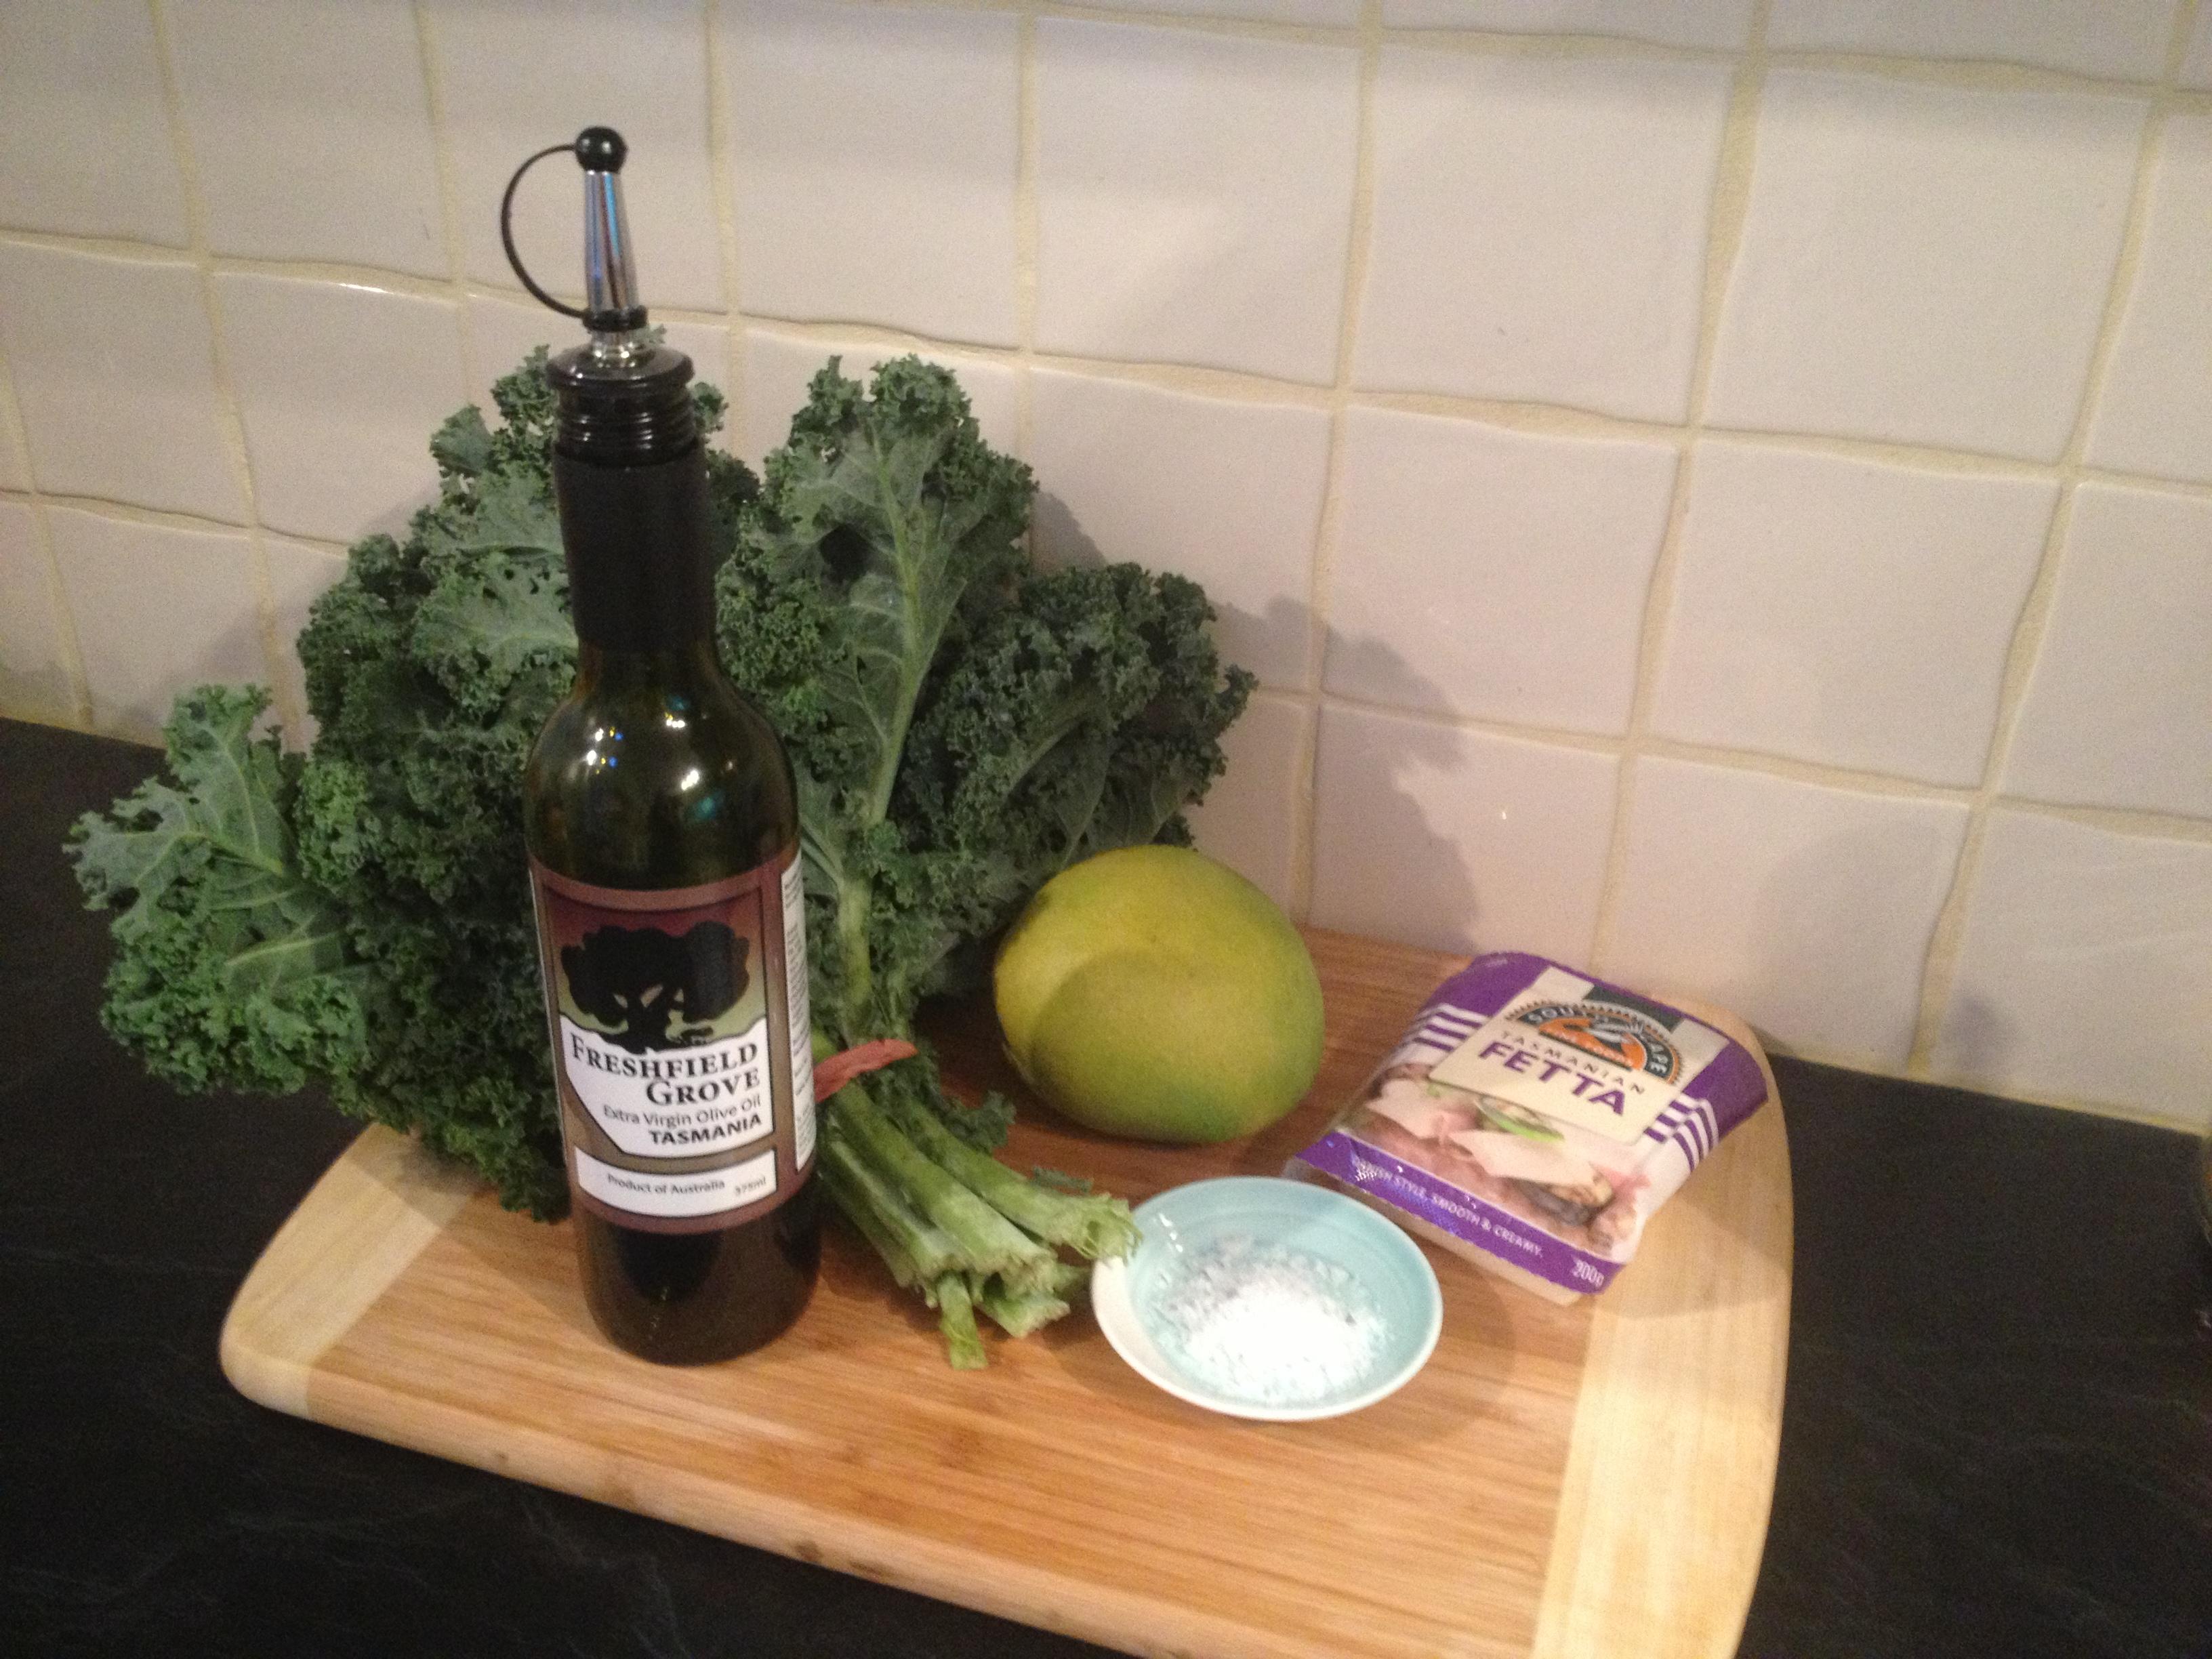 massaged kale salad ingredients evoo